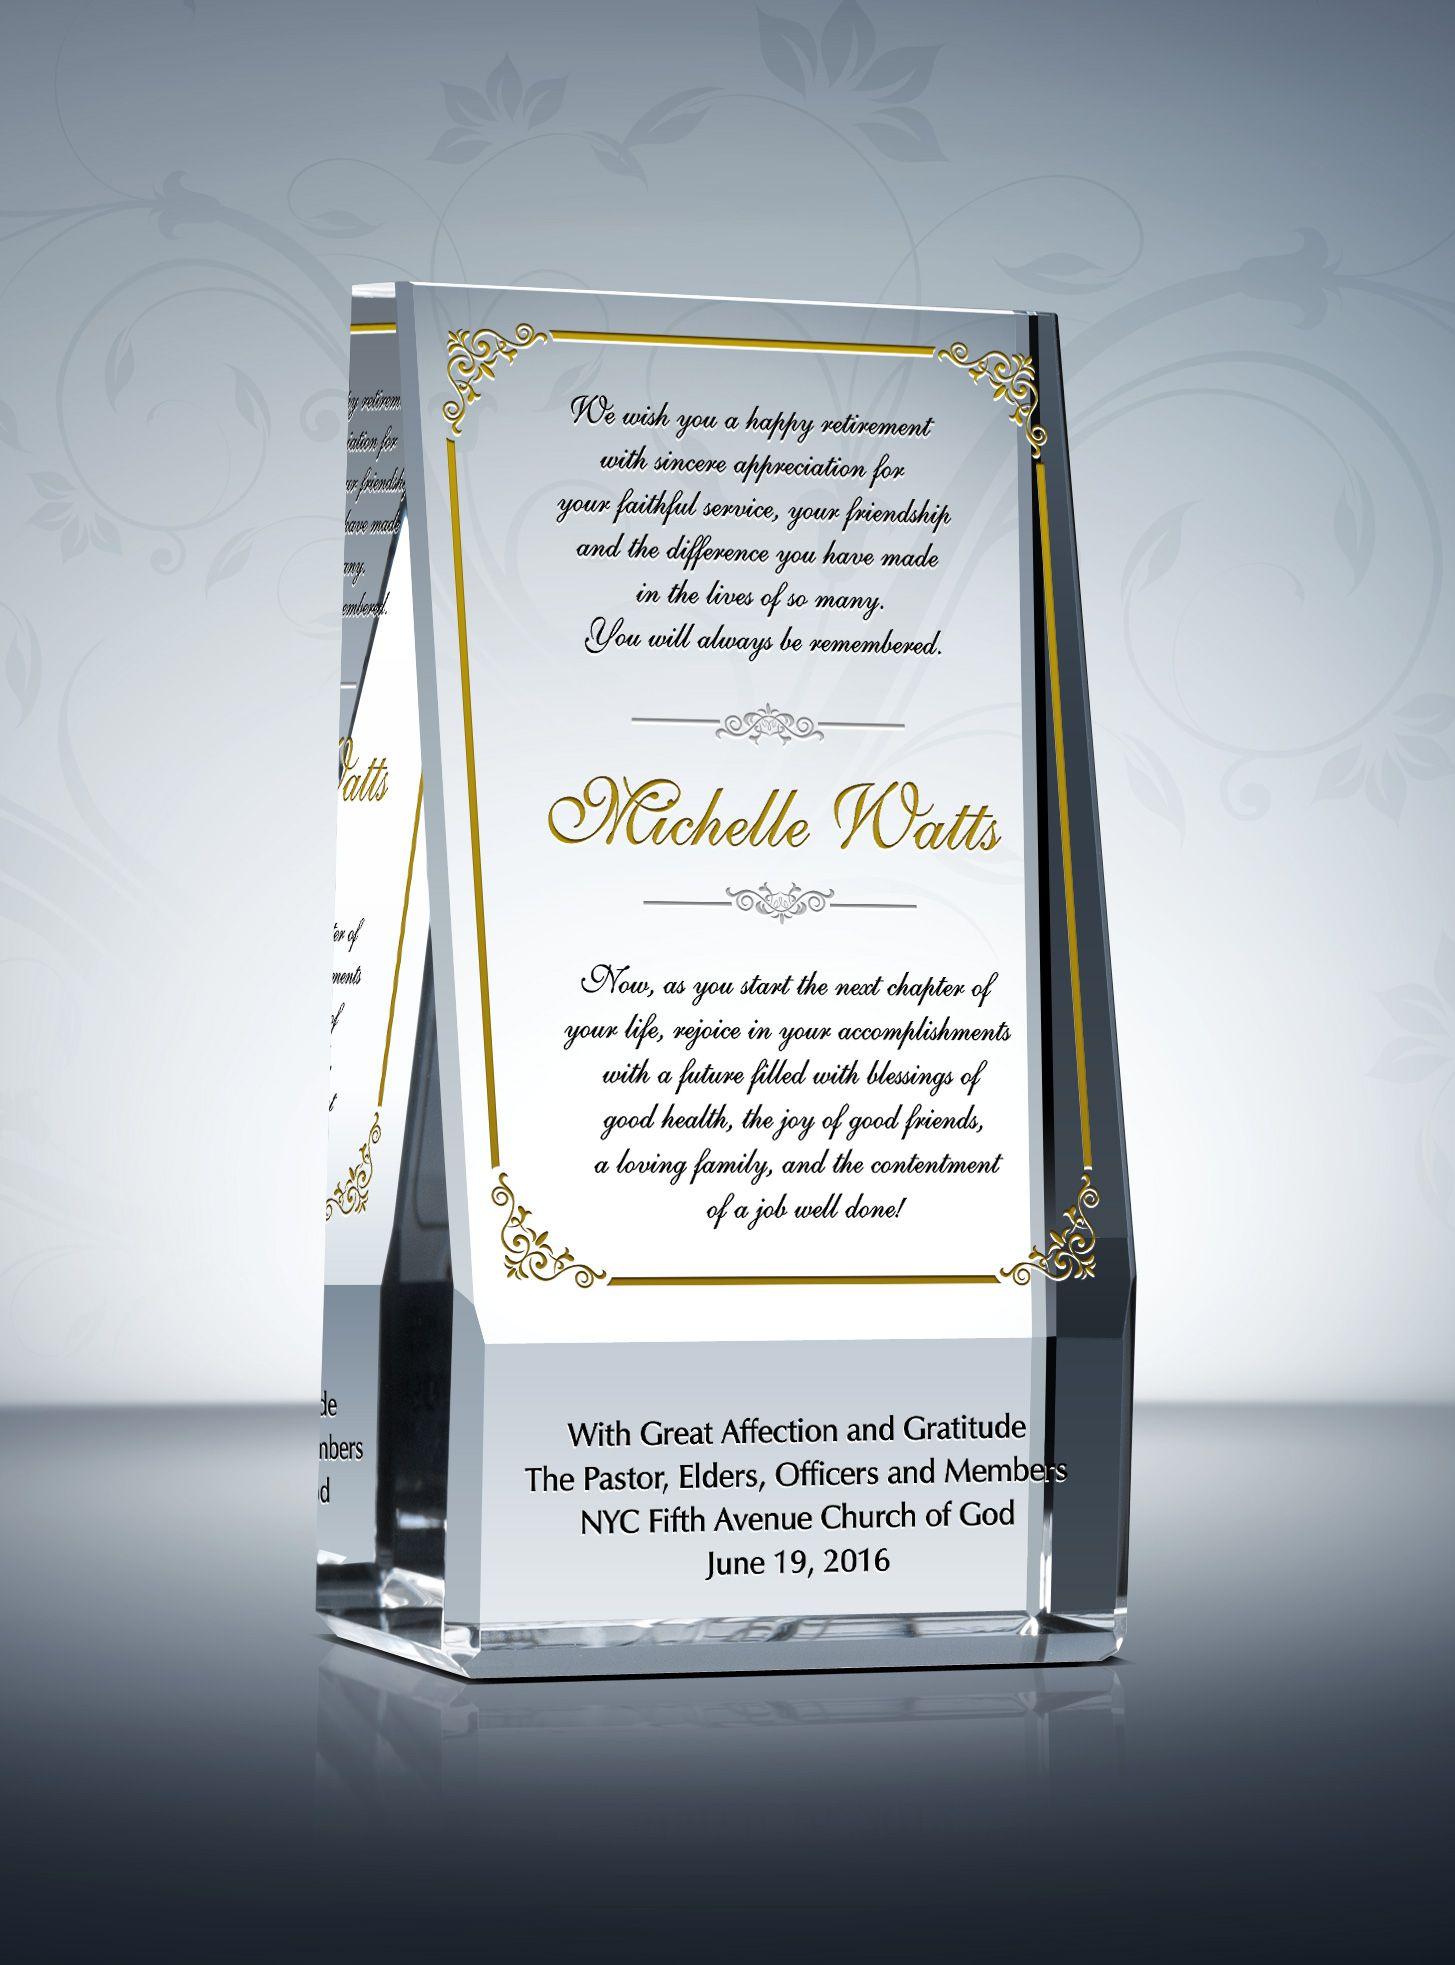 Wedge Pastoral Retirement Plaque | Pastor Gift Plaques ...